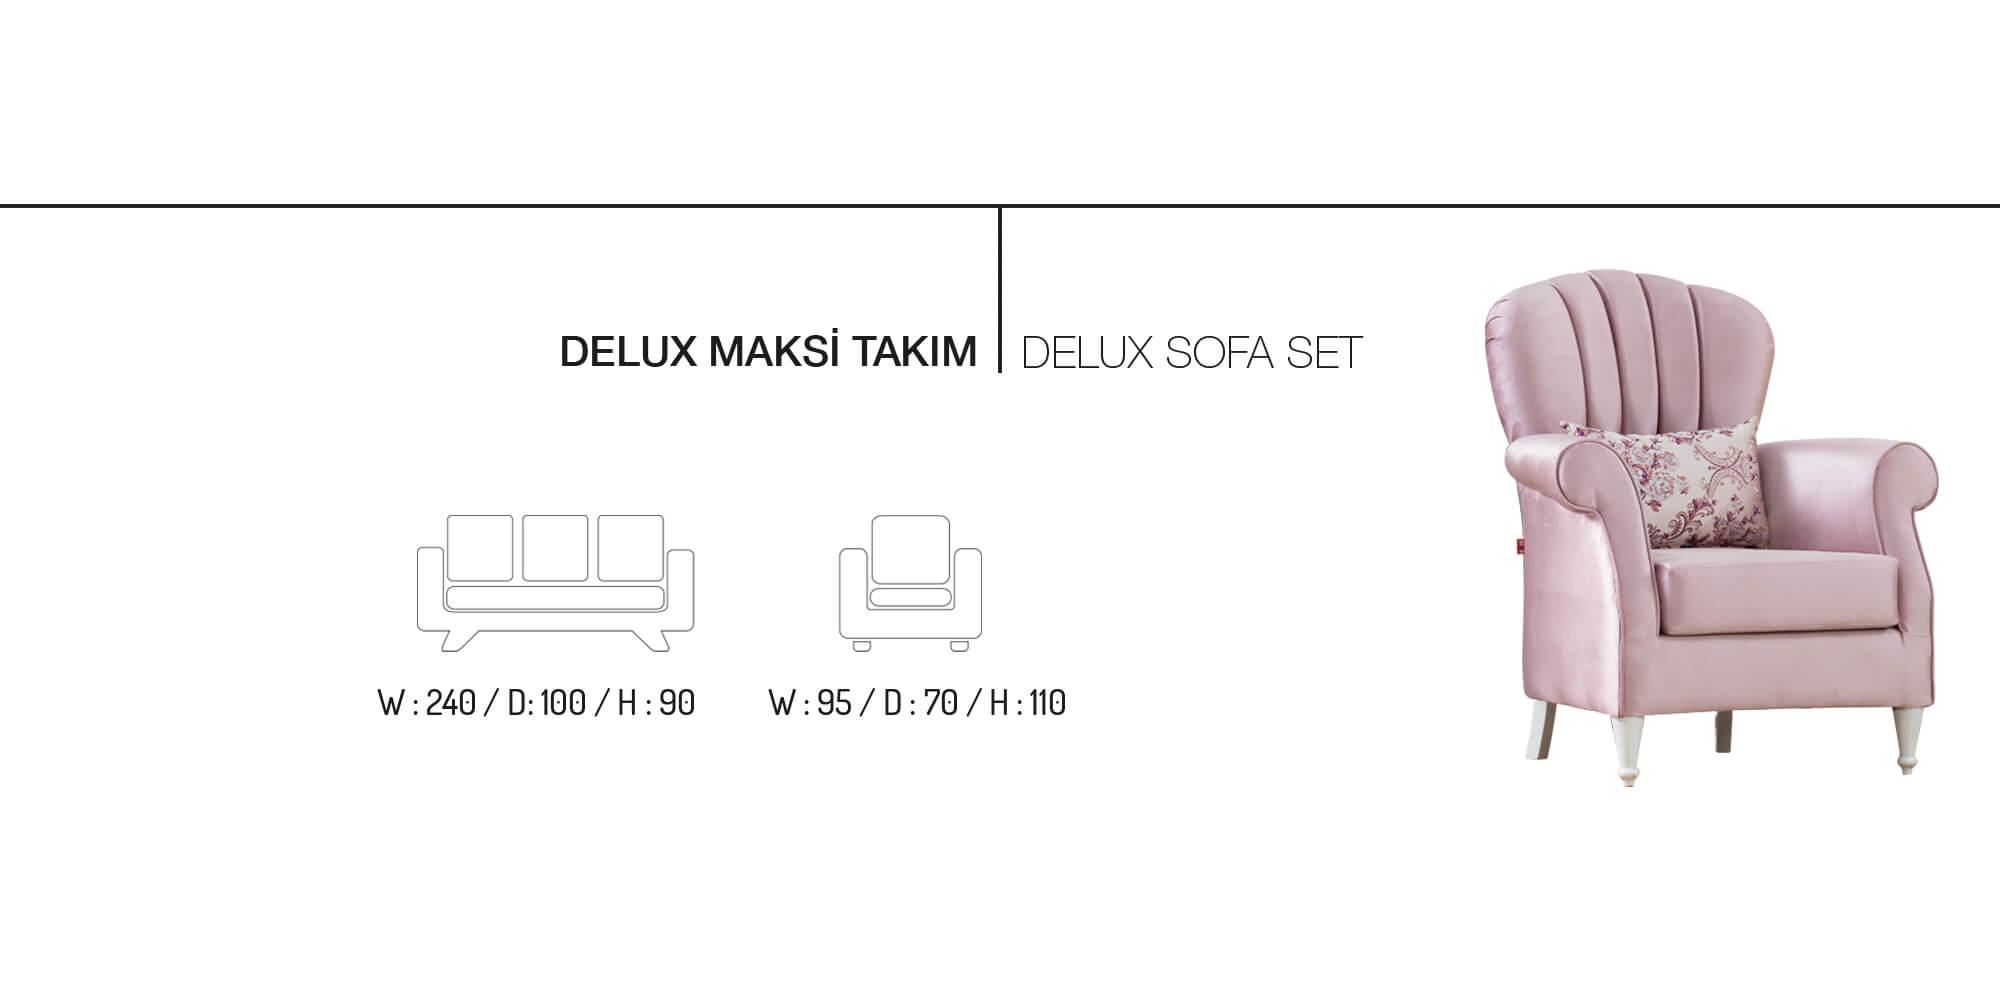 prenses-deluxe-sofa-set-4